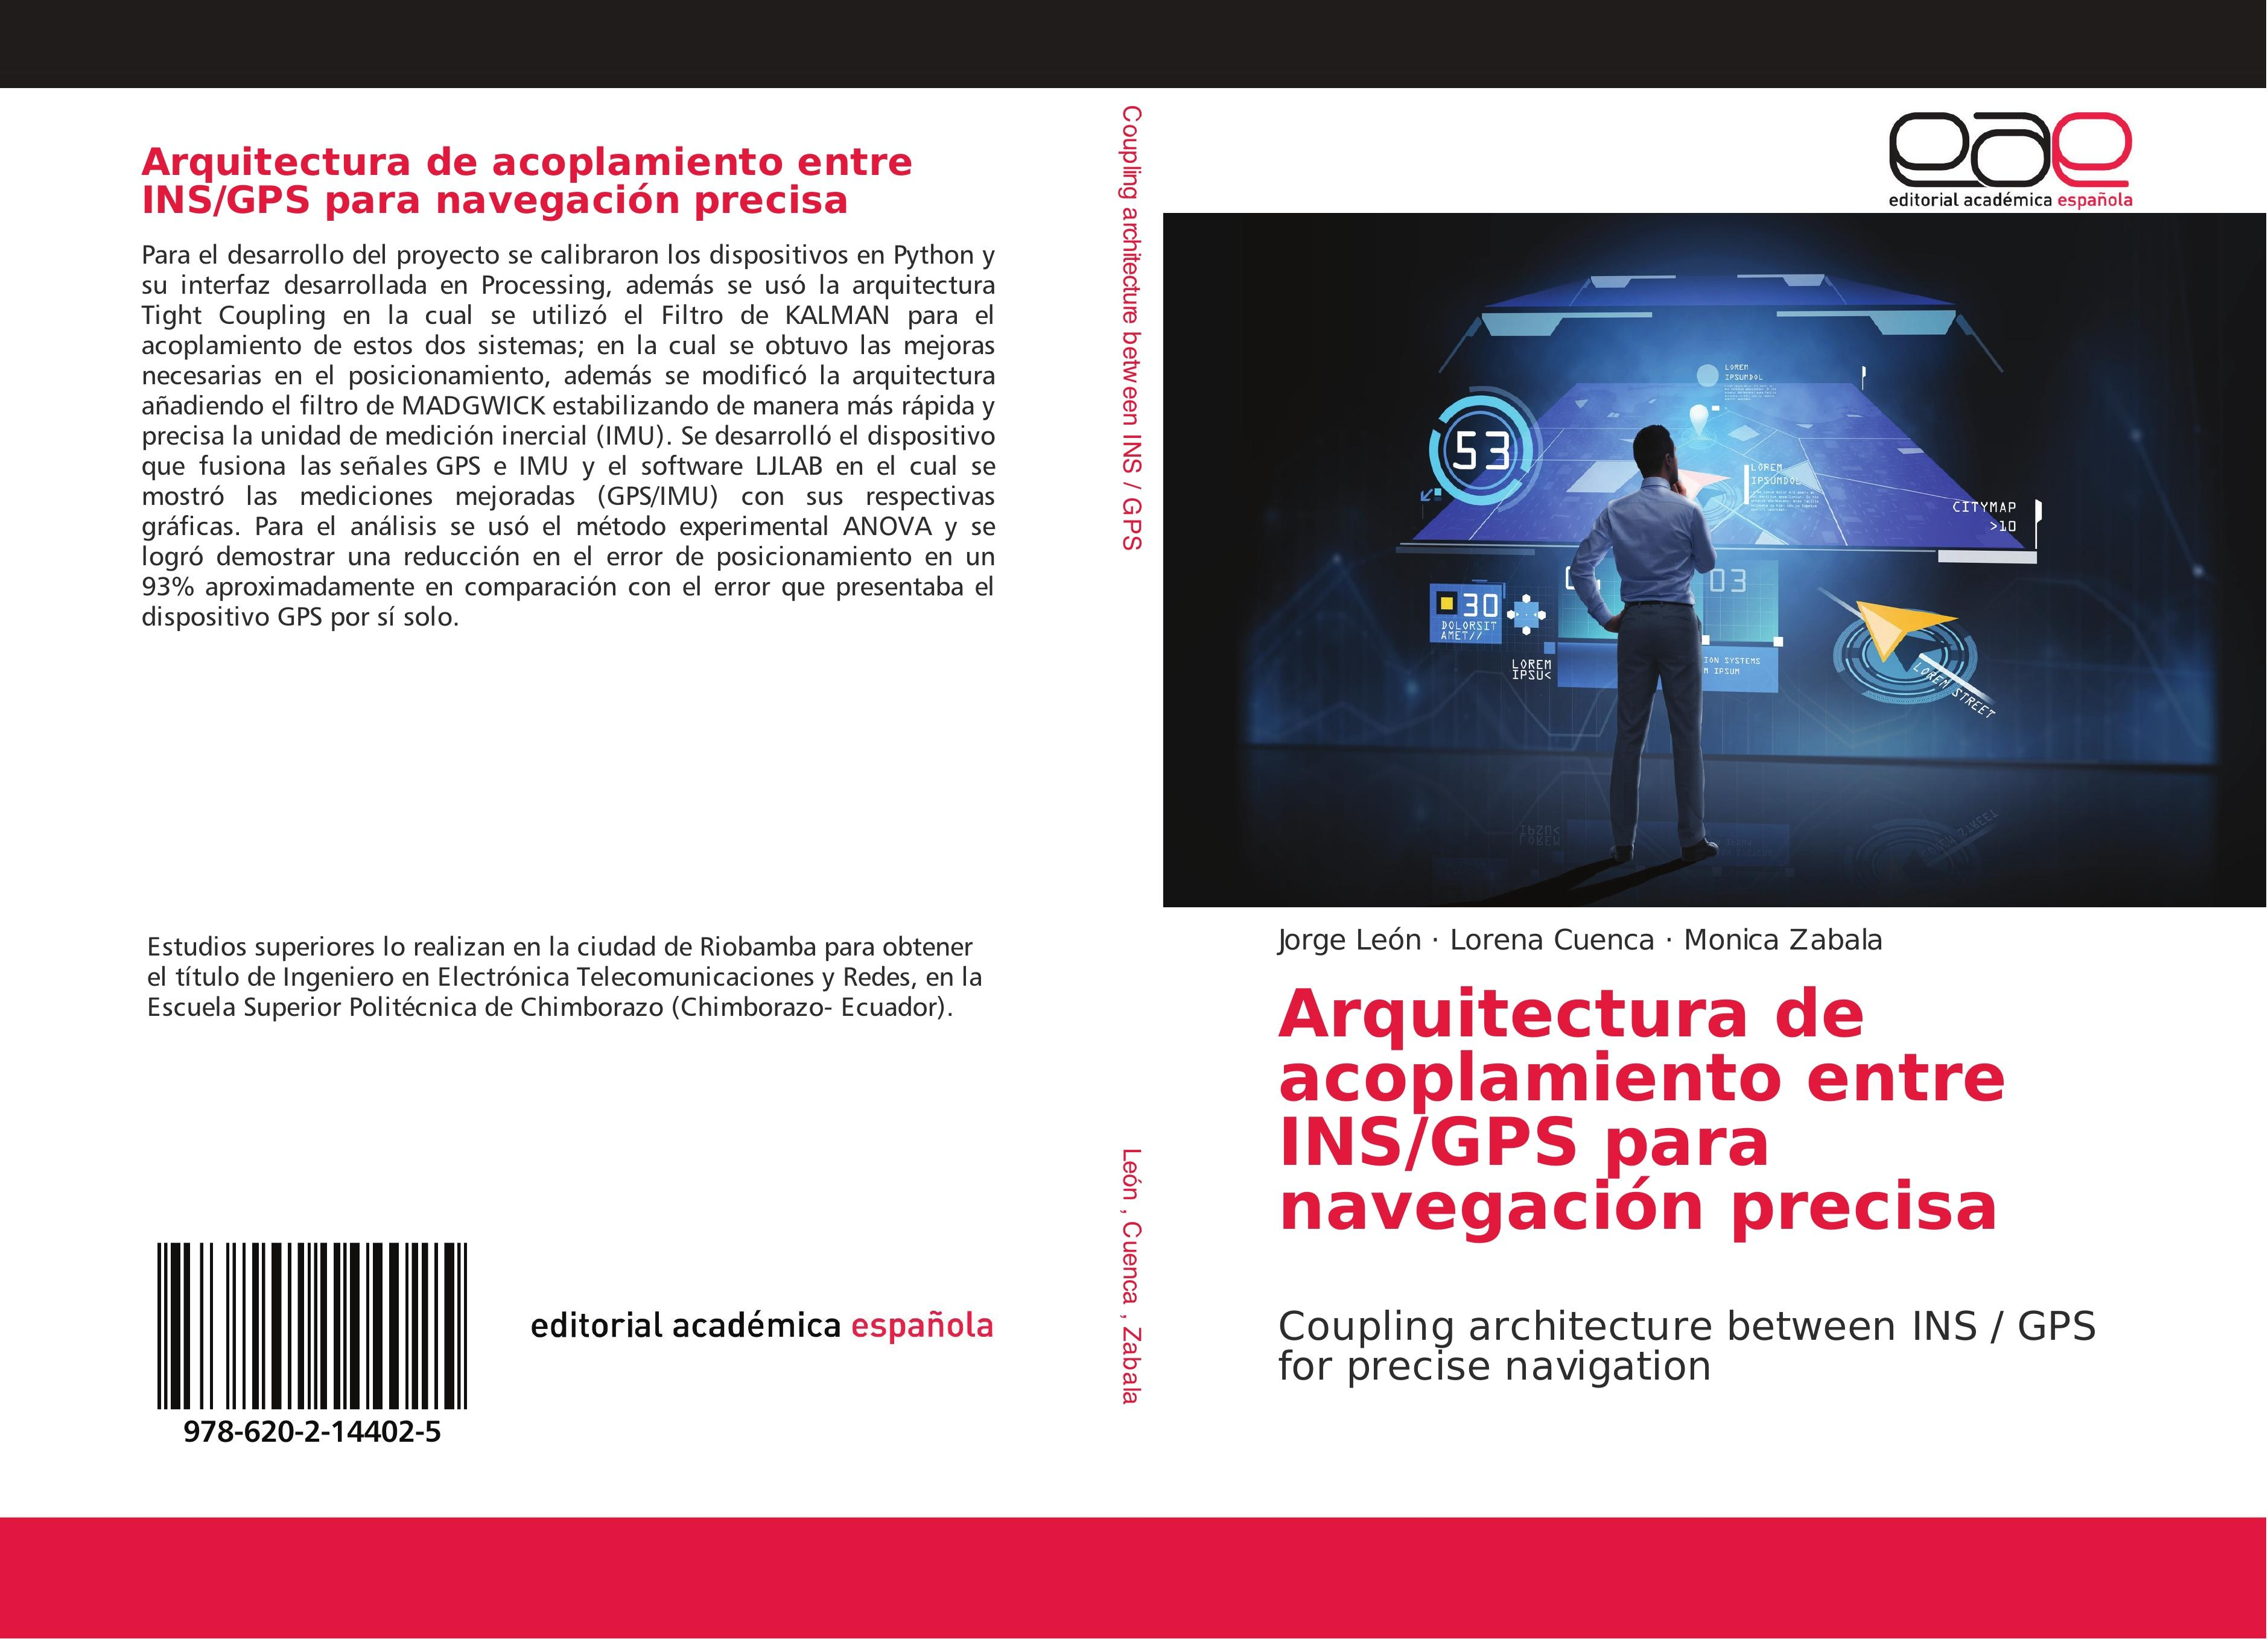 Arquitectura de acoplamiento entre INS/GPS para navegacin precisa  Coupling architecture between INS / GPS for precise navigation  Jorge Len  Taschenbuch  Paperback  Spanisch  2018 - Len, Jorge